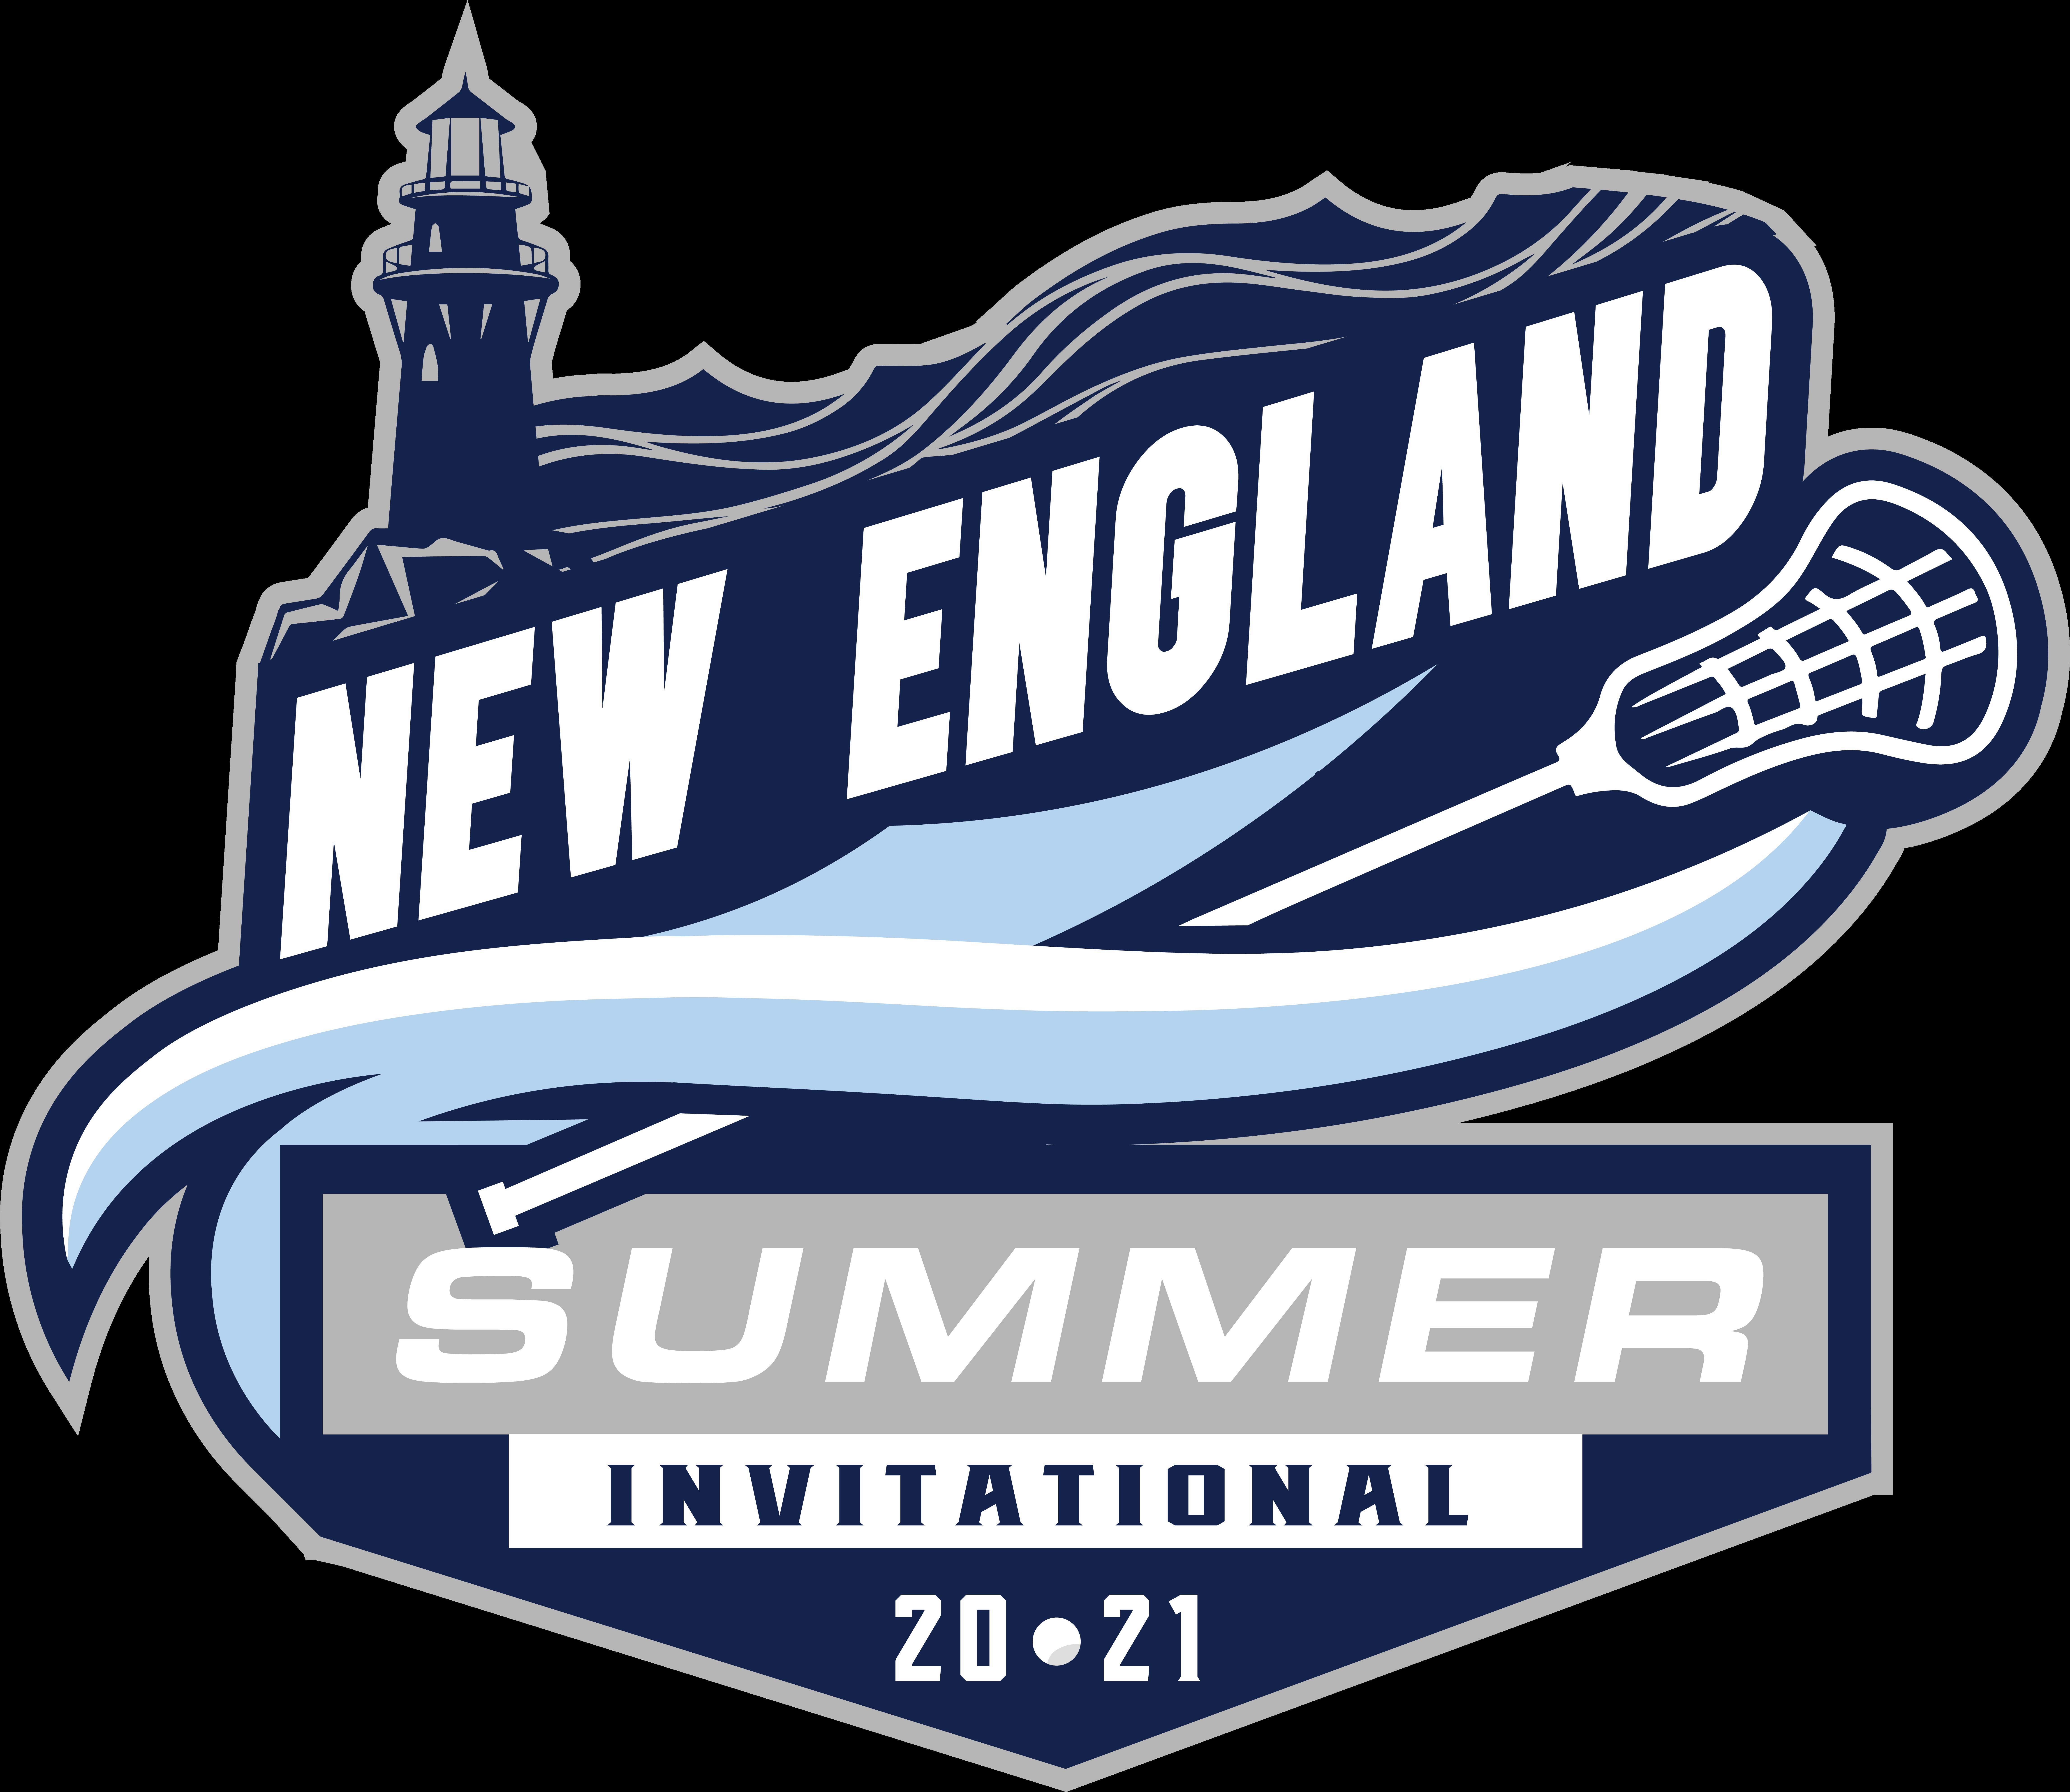 New England Invitational